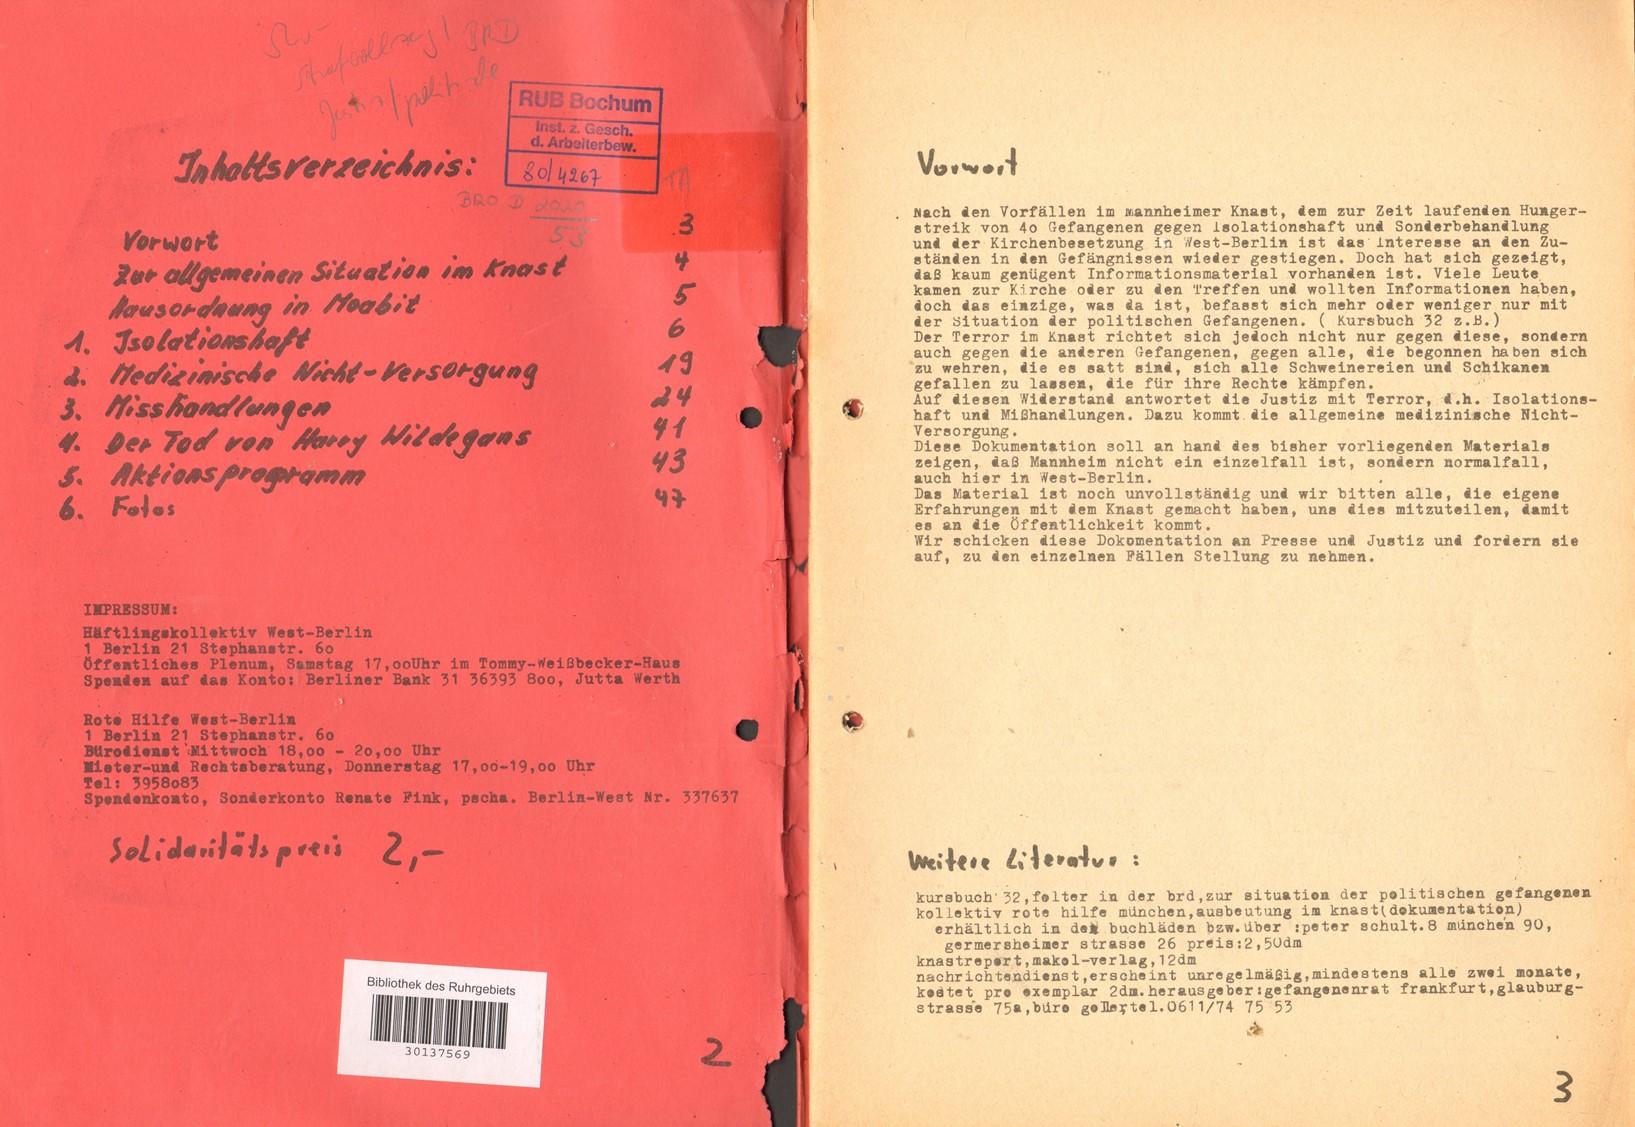 Berlin_RH_1974_Terror_im_Knast_02